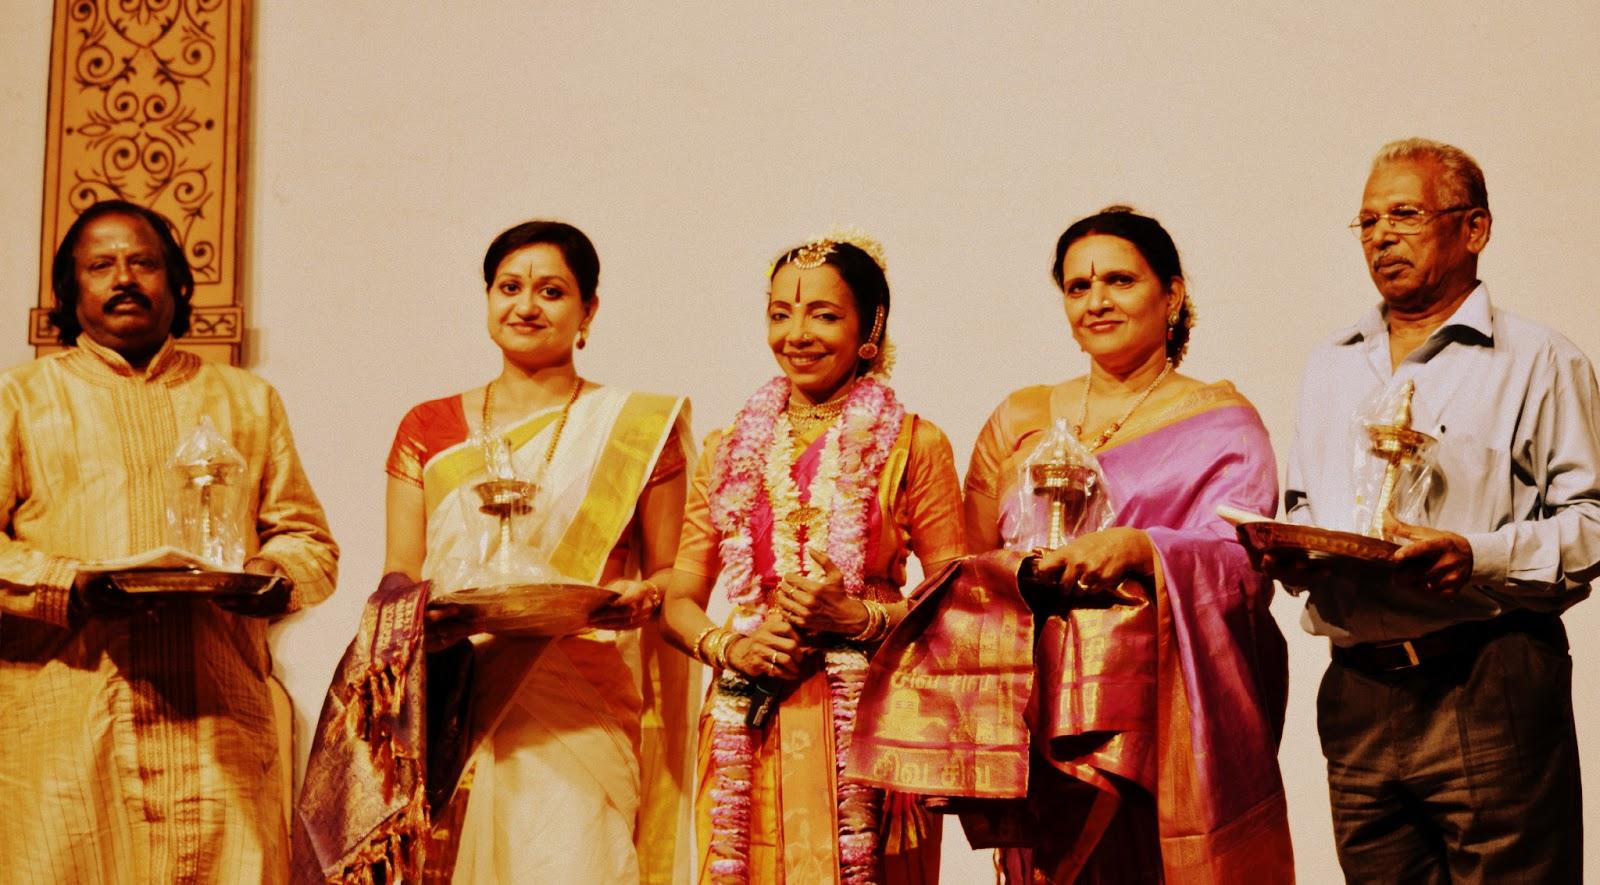 Subramaniam badrinath wedding invitations